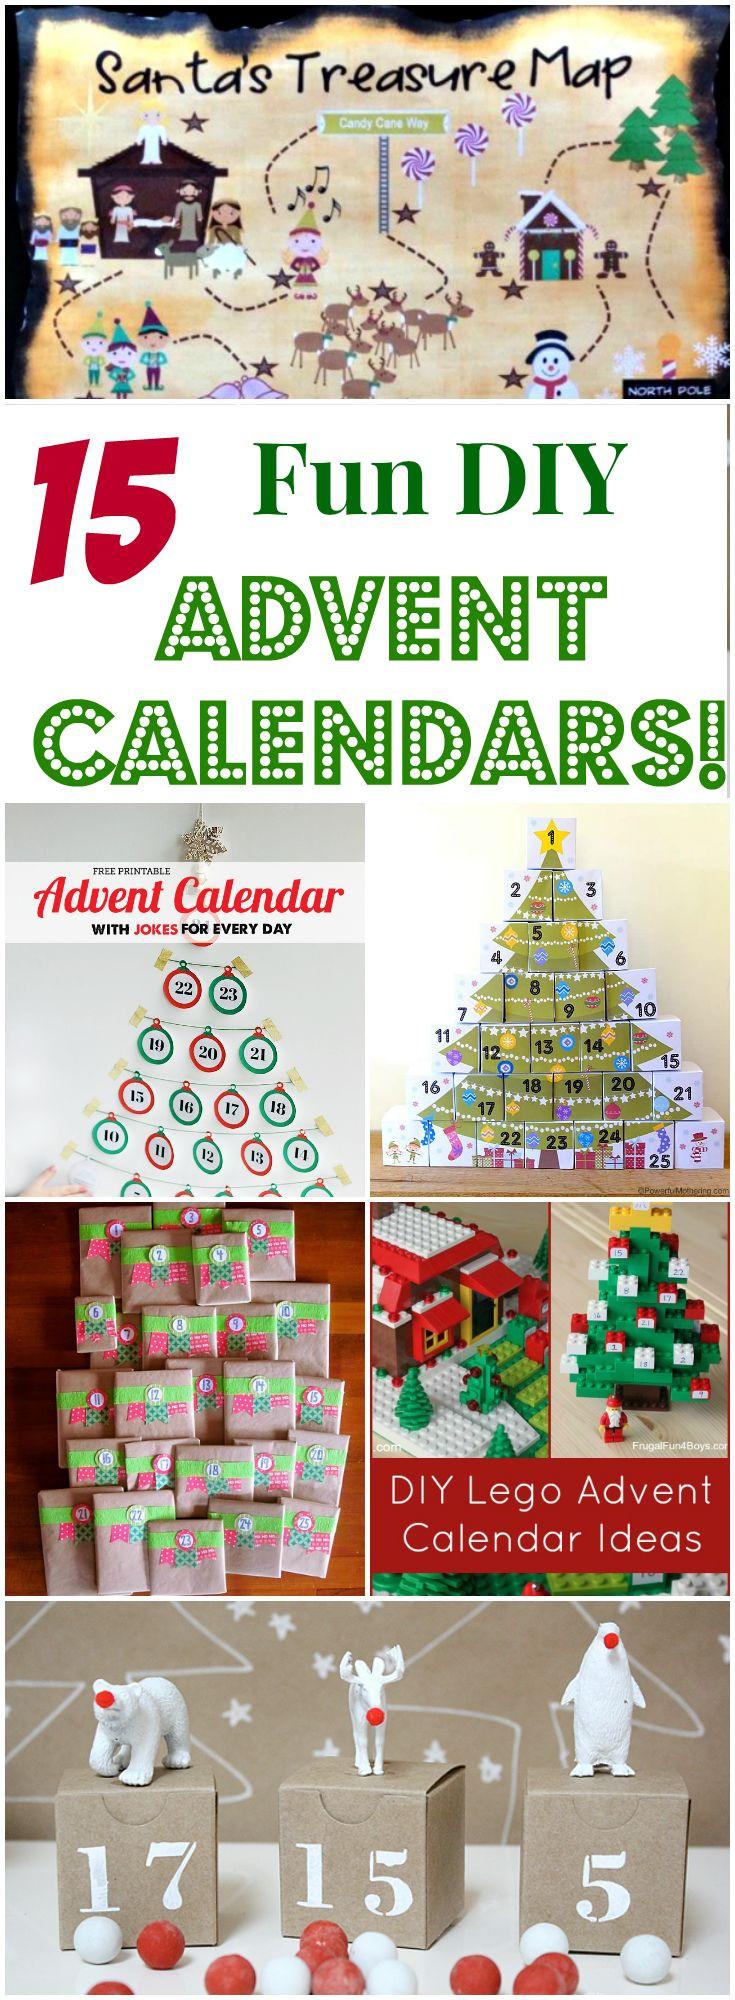 DIY Advent Calendars For Kids  15 Fun DIY Advent Calendars for Kids